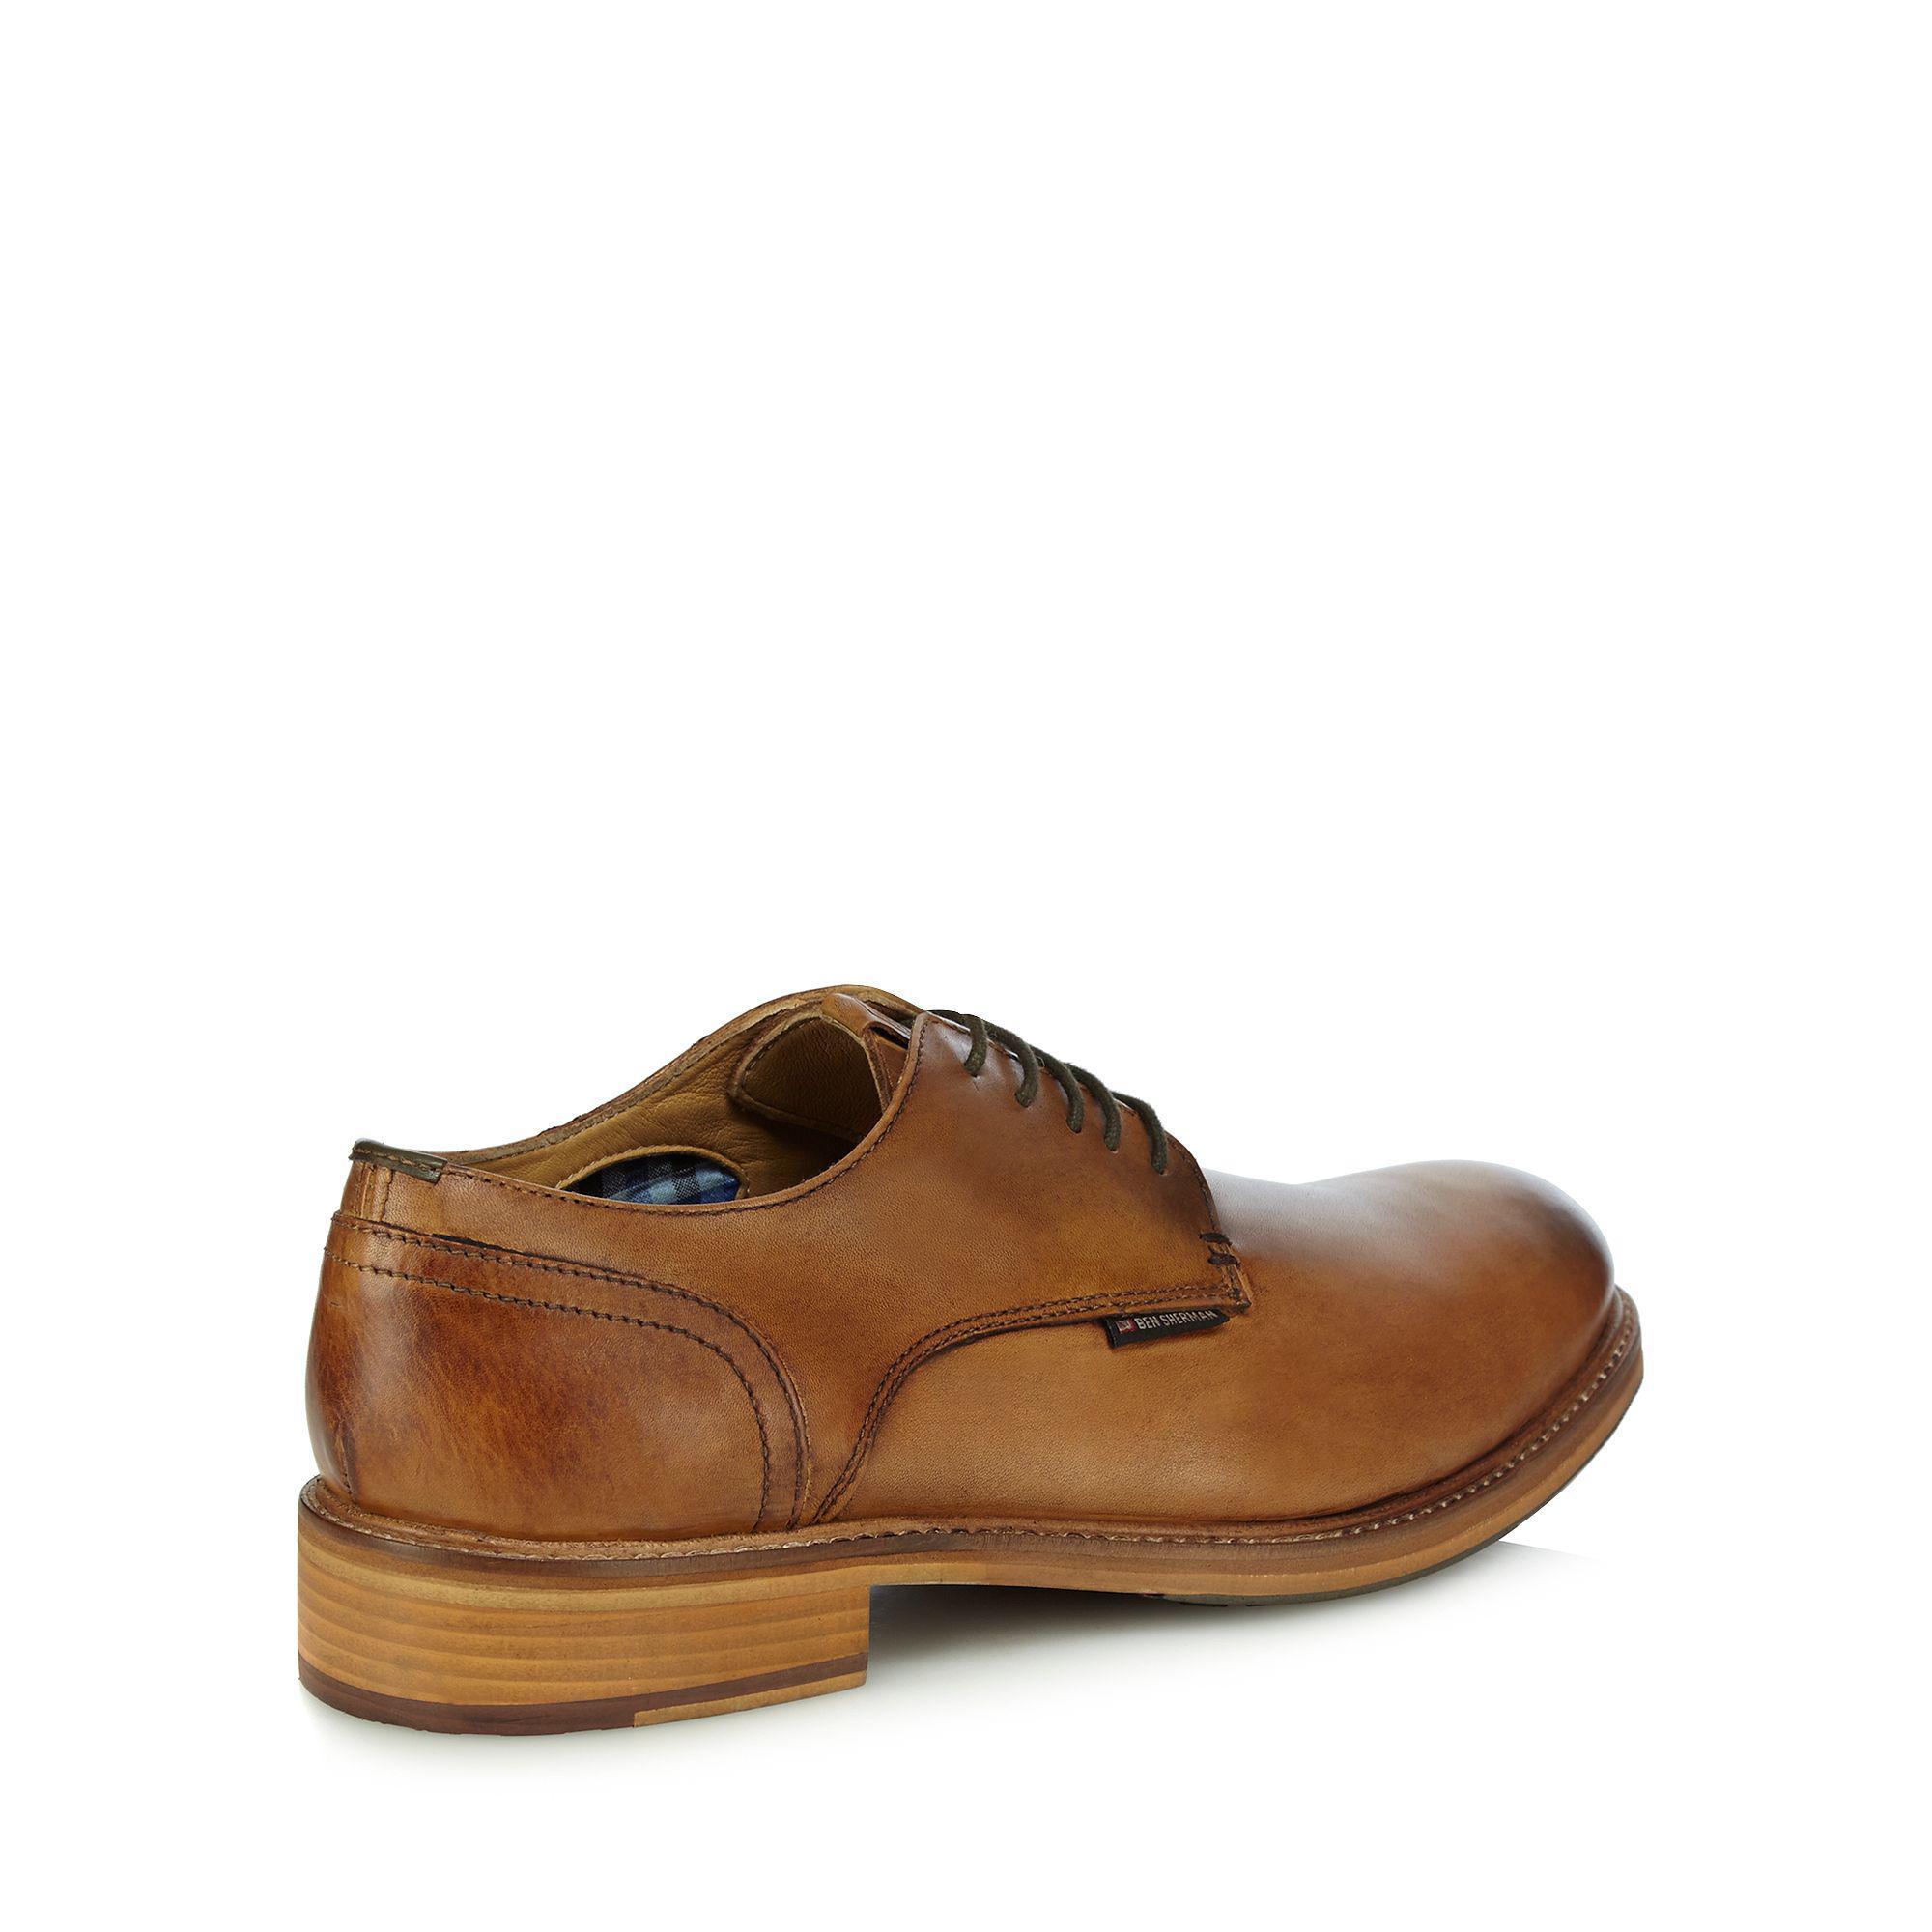 Ben Sherman Tan Leder Derby Schuhes in Men Braun for Men in Lyst f3c02b